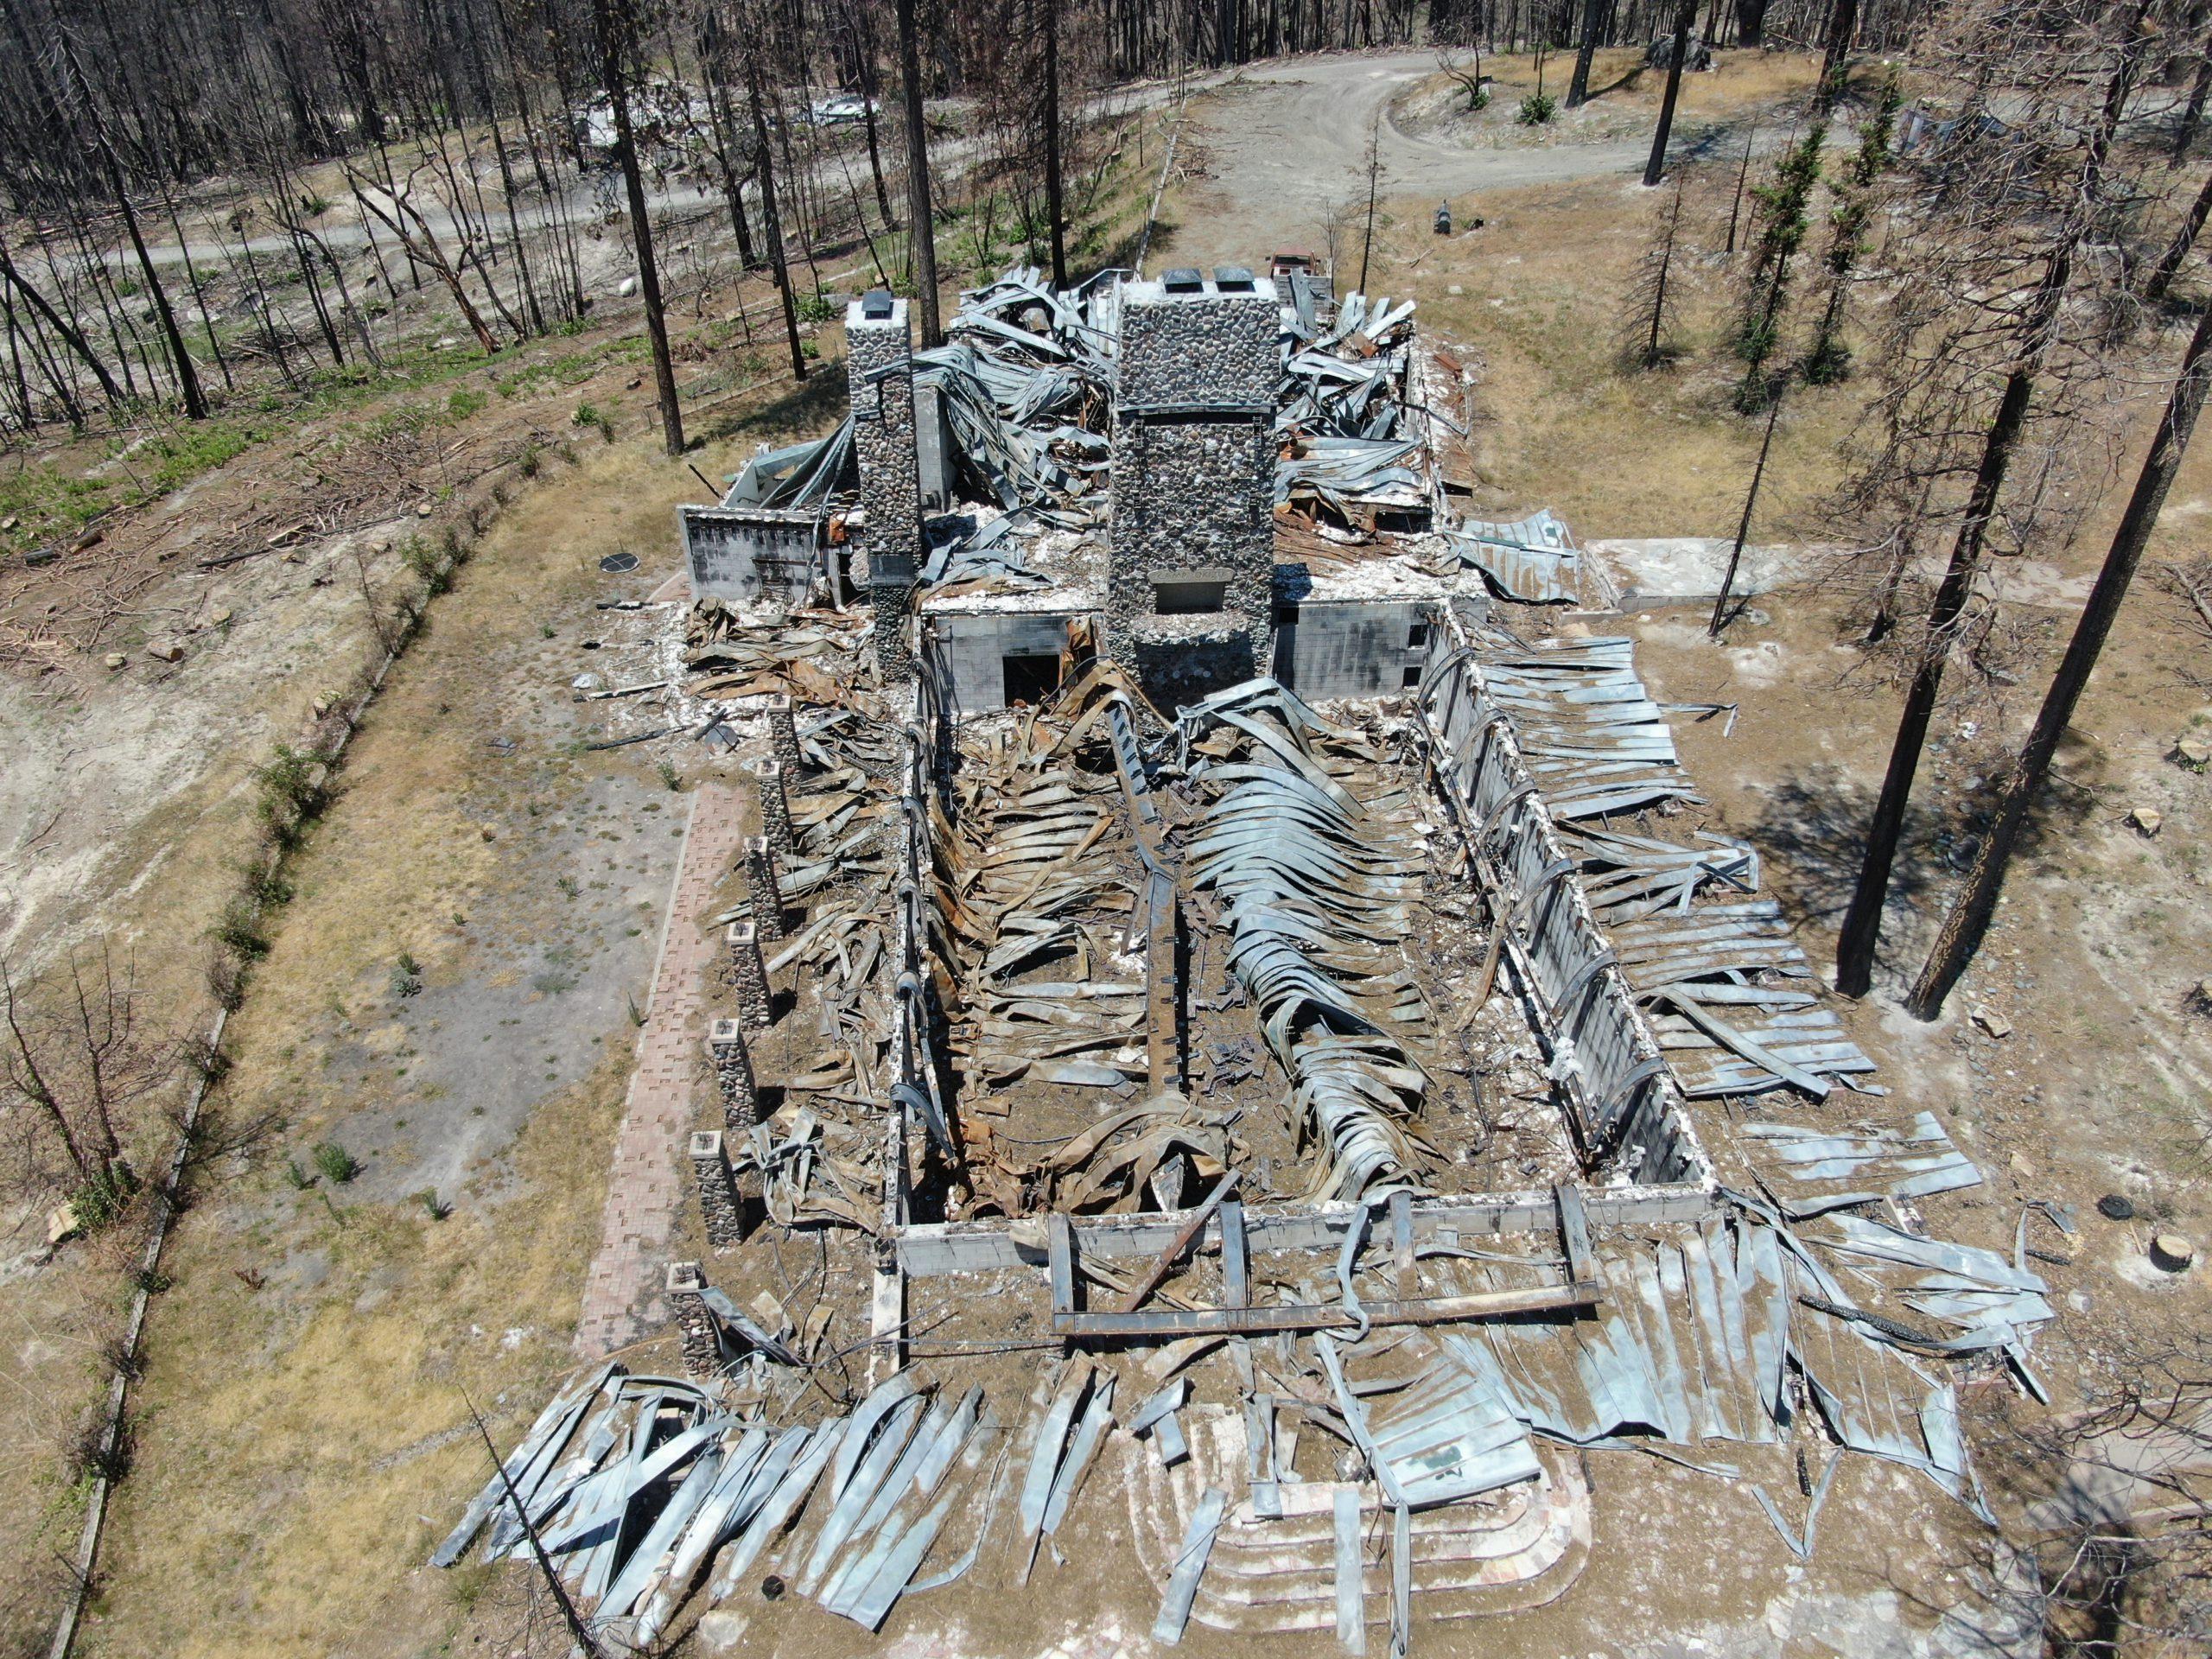 Burned structural debris at Camp Okizu